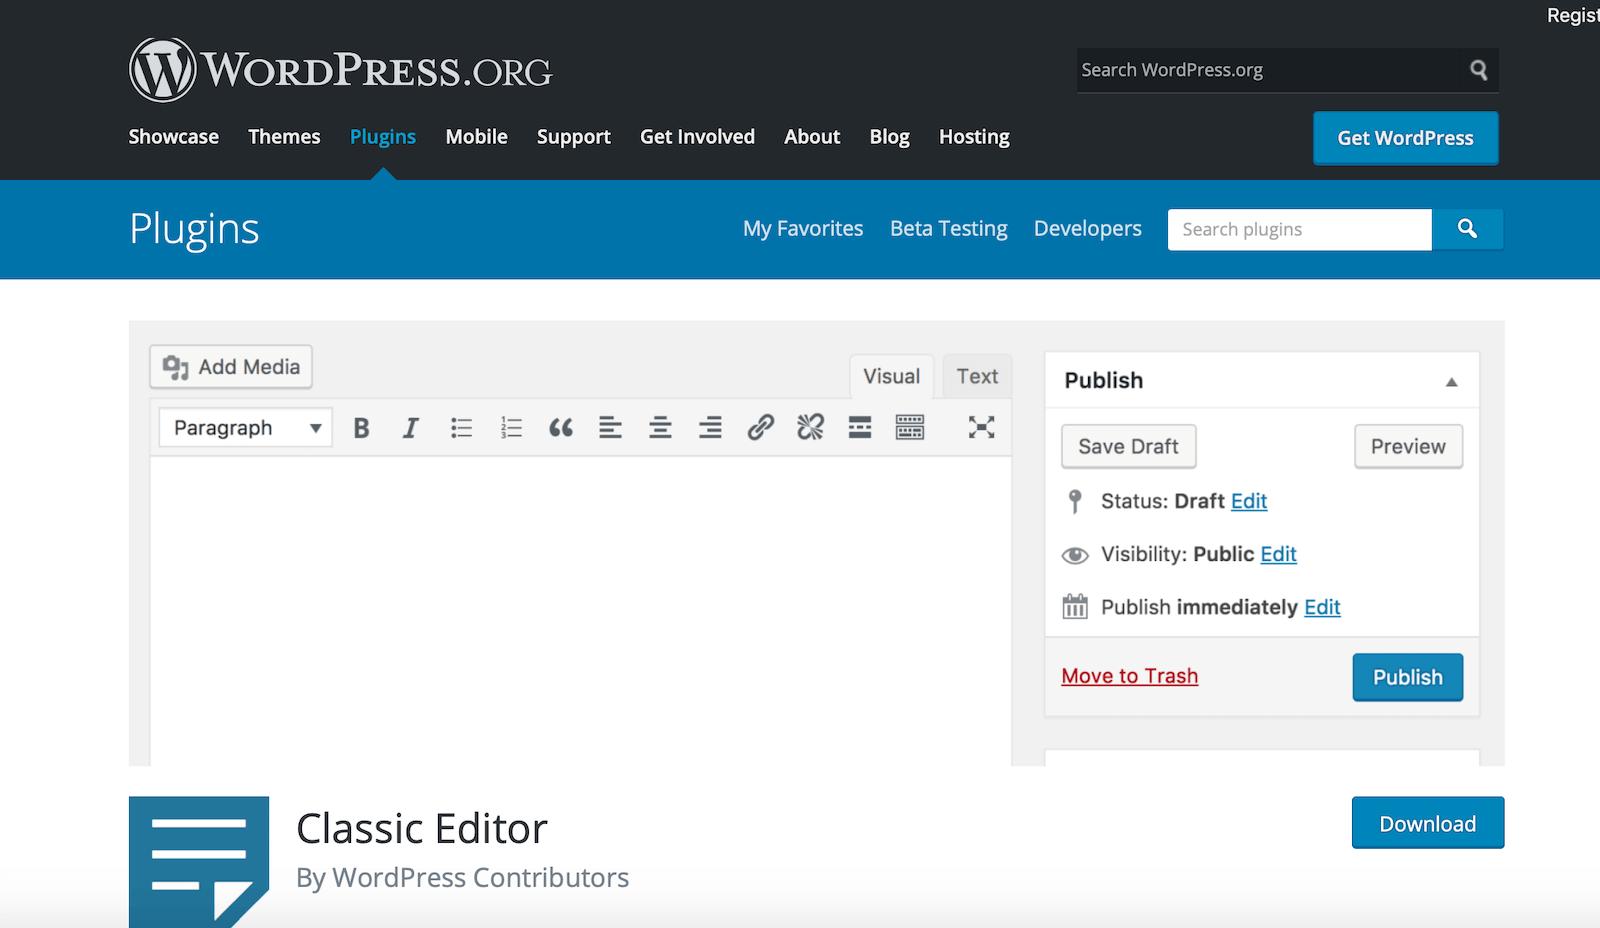 Classic Editor Plugin - Avoid Gutenberg Editor